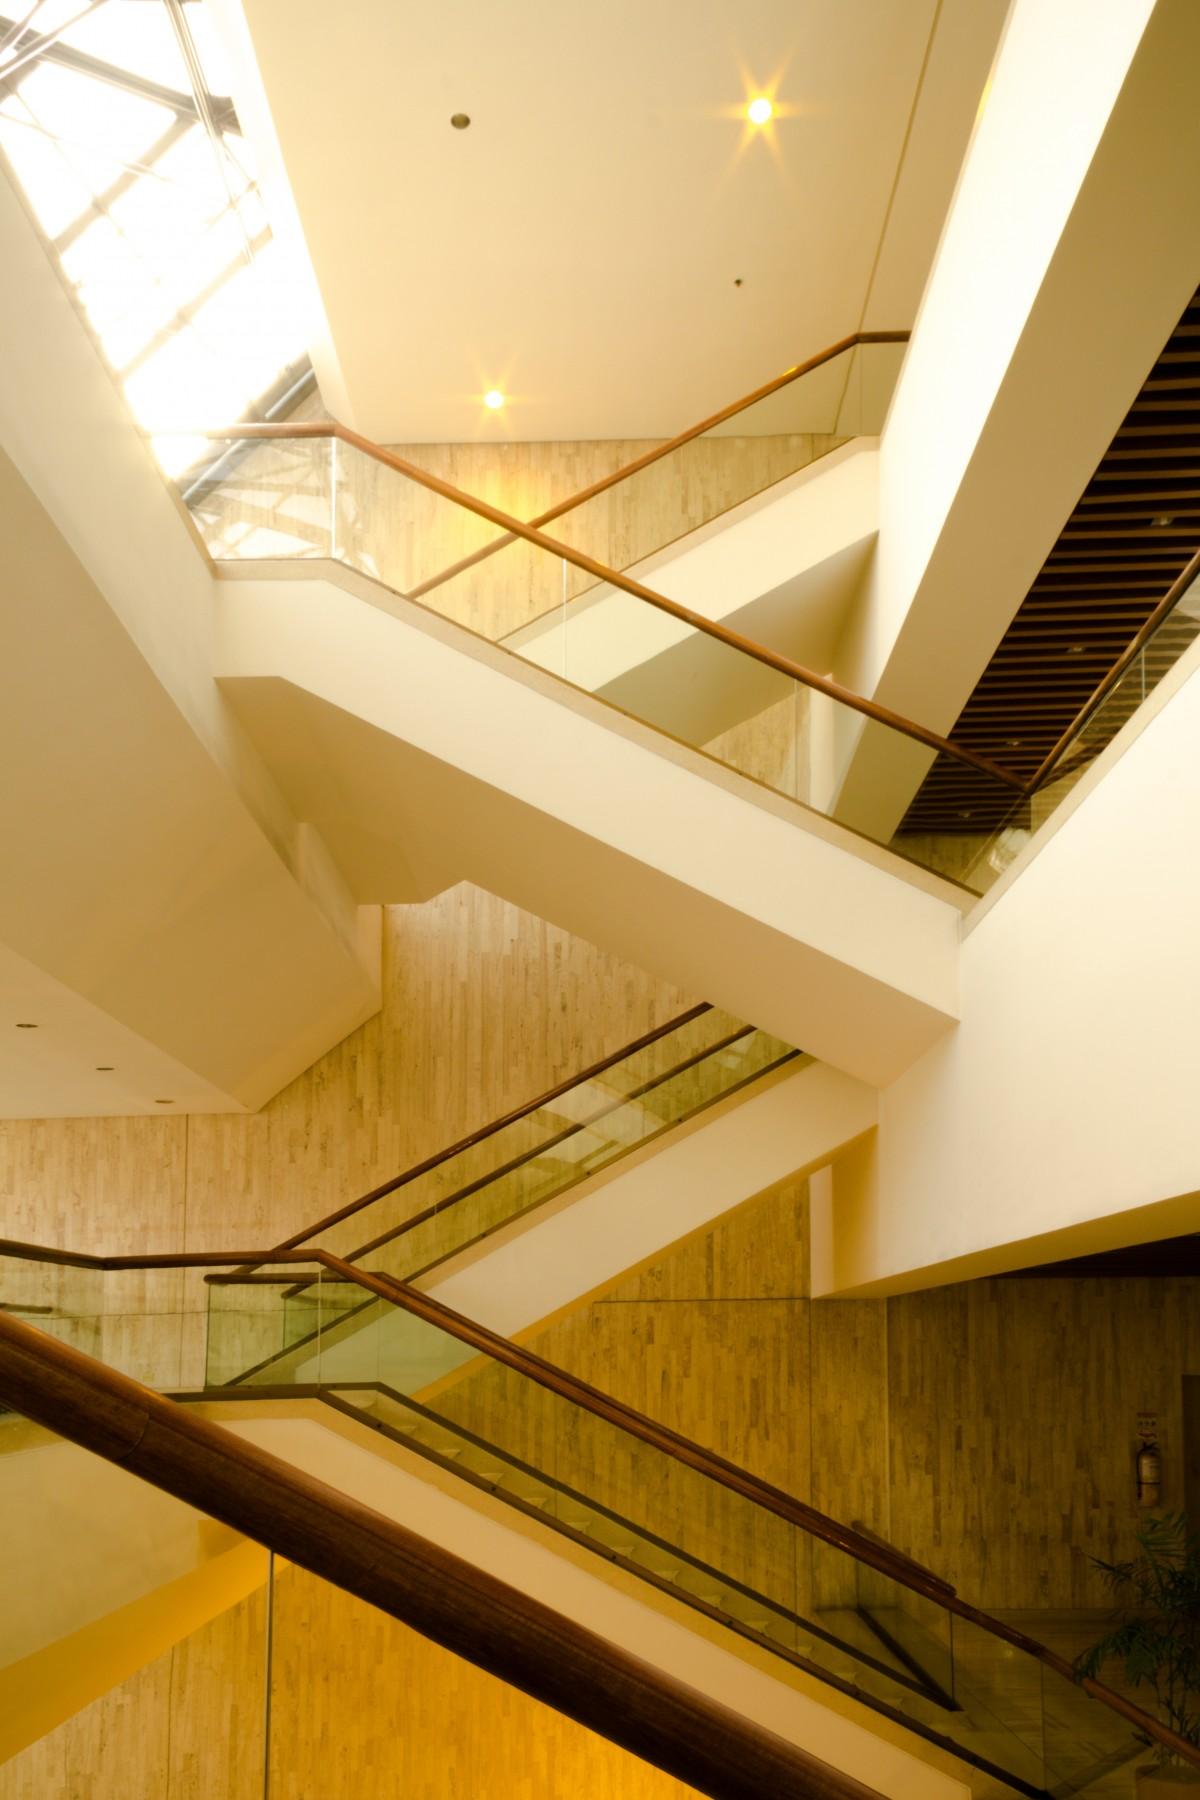 Fotos gratis arquitectura piso techo l nea for Arquitectura en linea gratis